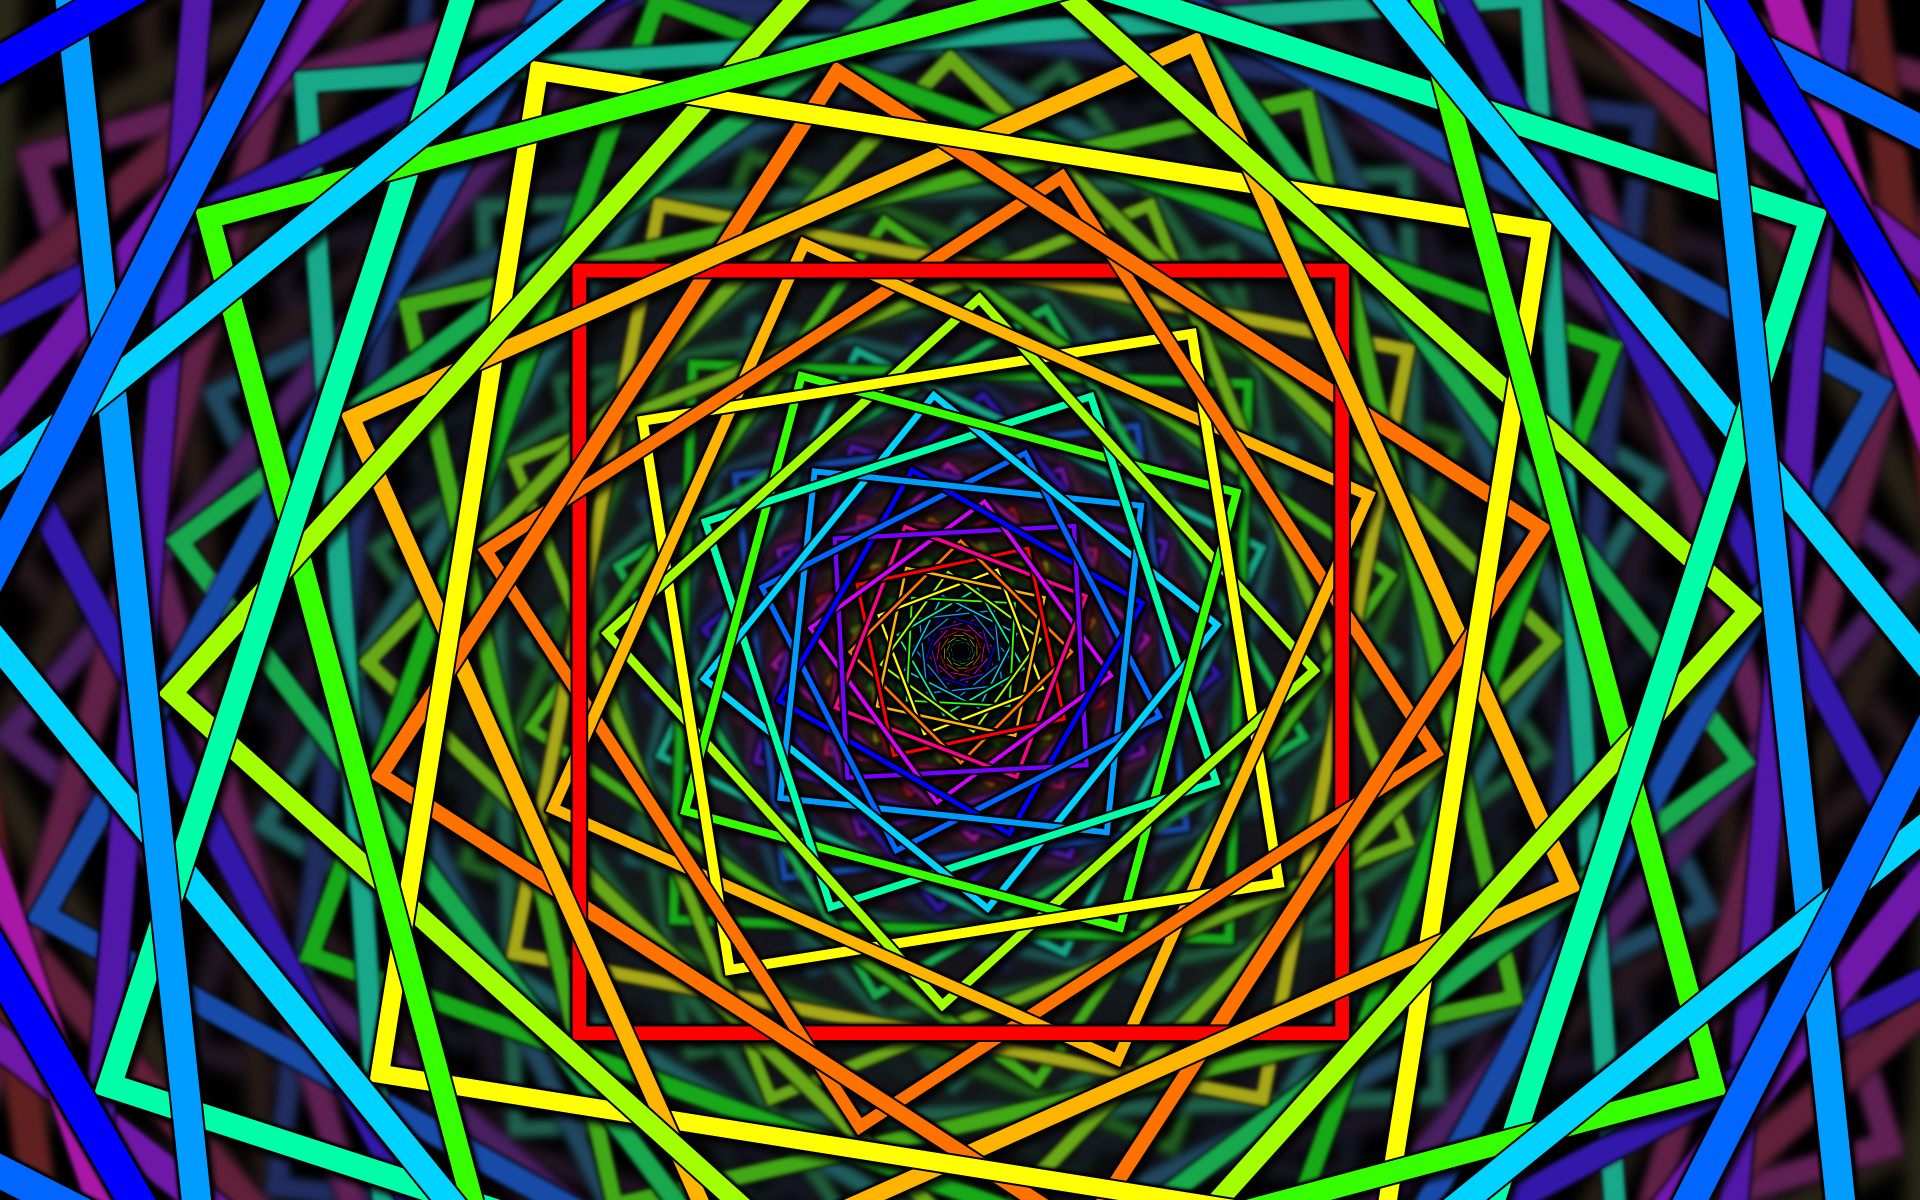 Abstract Art Colorfull Wallpaper Pics 3146 Wallpaper 1920x1200